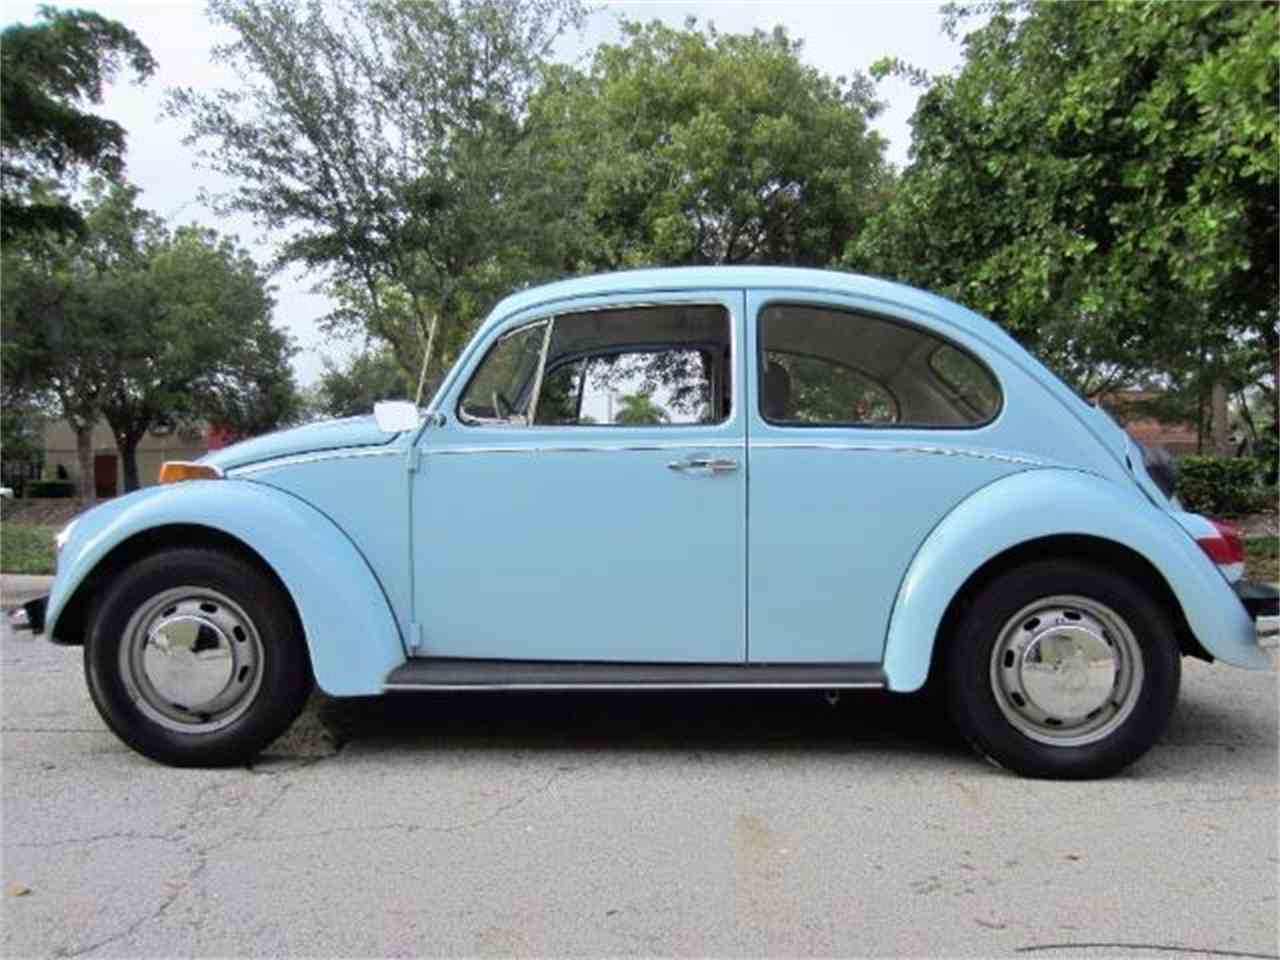 1970 Volkswagen Beetle For Sale Classiccars Com Cc 935009